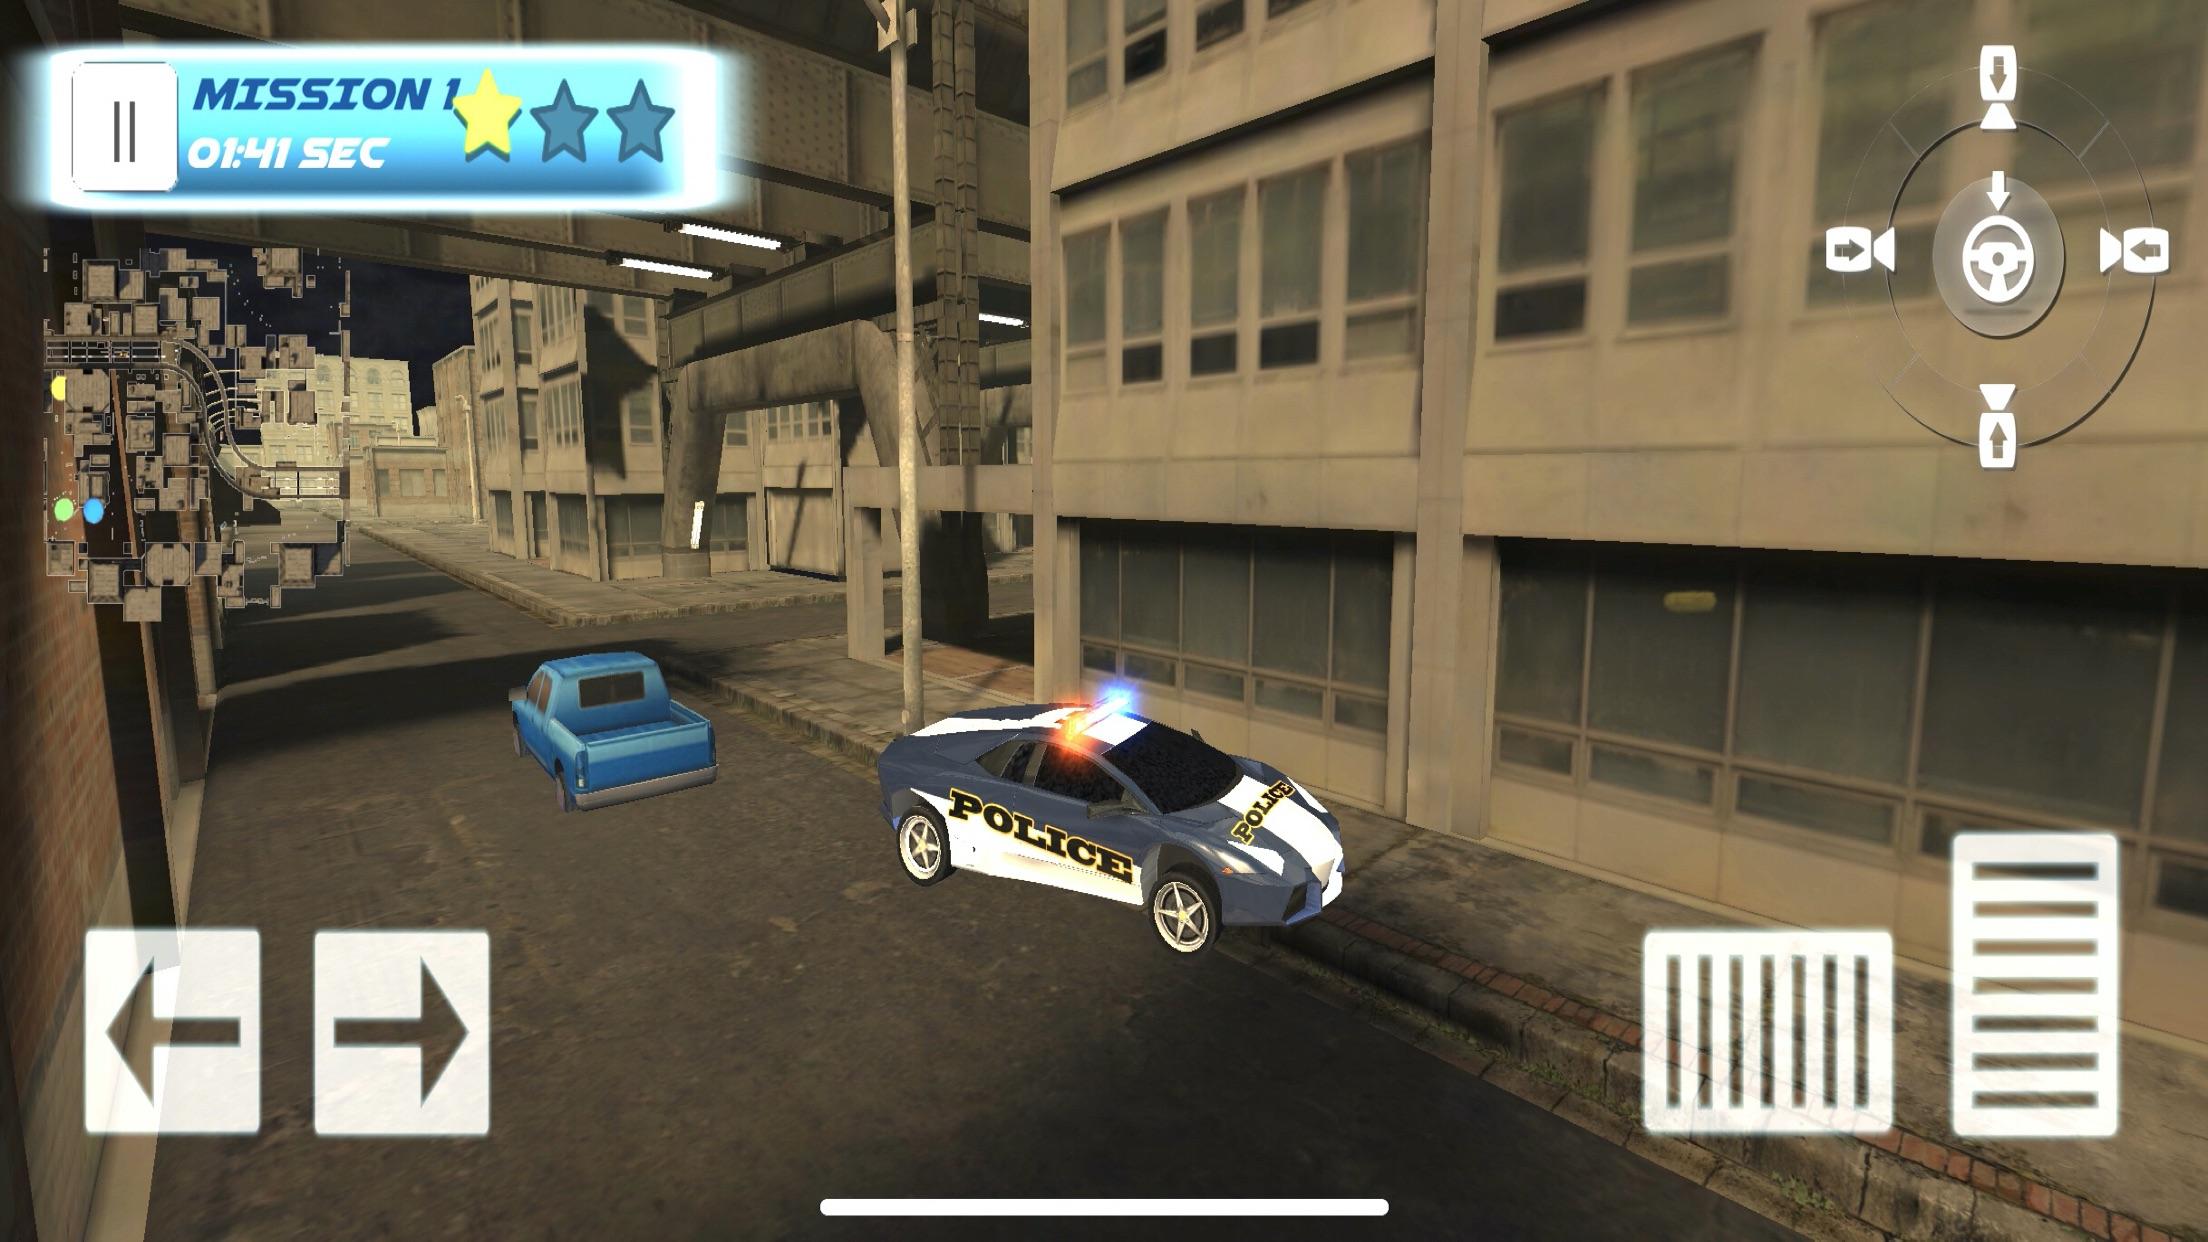 3DPolice Car Parking Screenshot